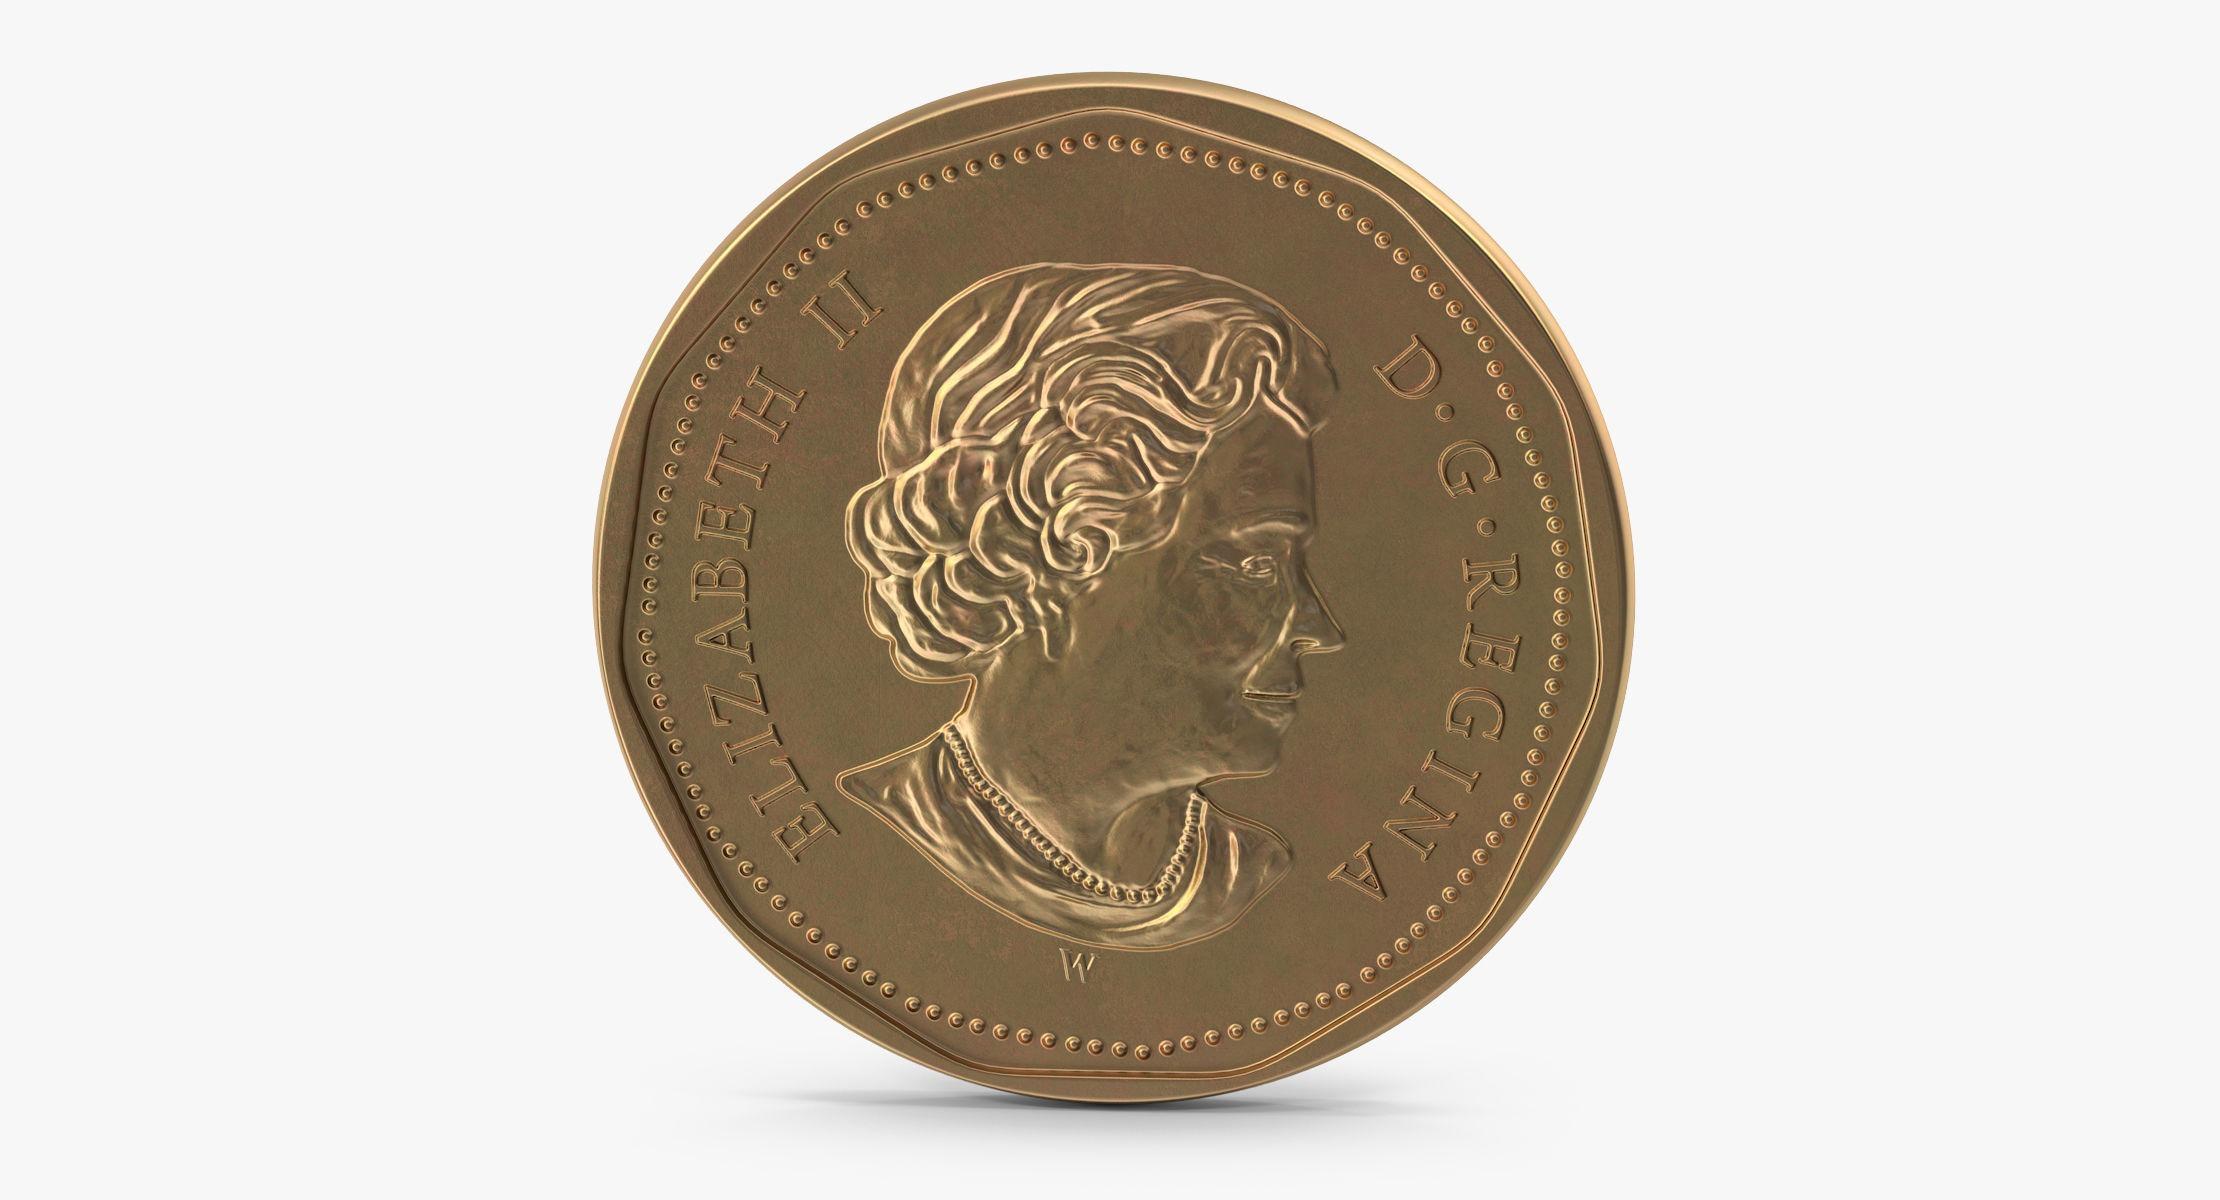 1 Dollar Coin Canada (Loonie) - reel 1